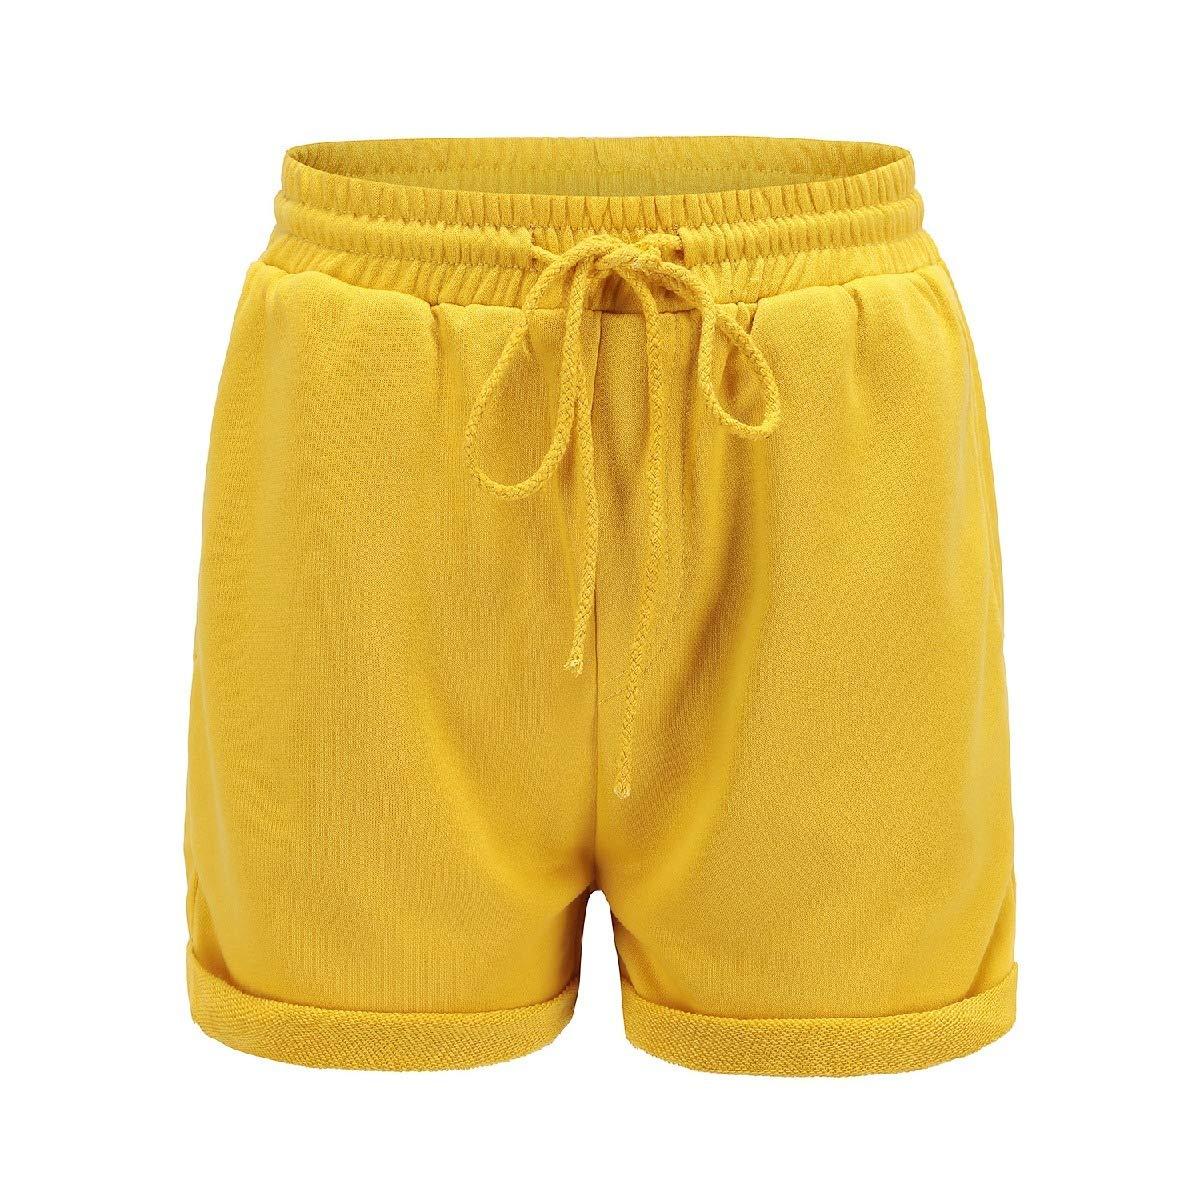 Andopa Womens Flyaway Short Folded Hem Fashionable Casual Leisure Short